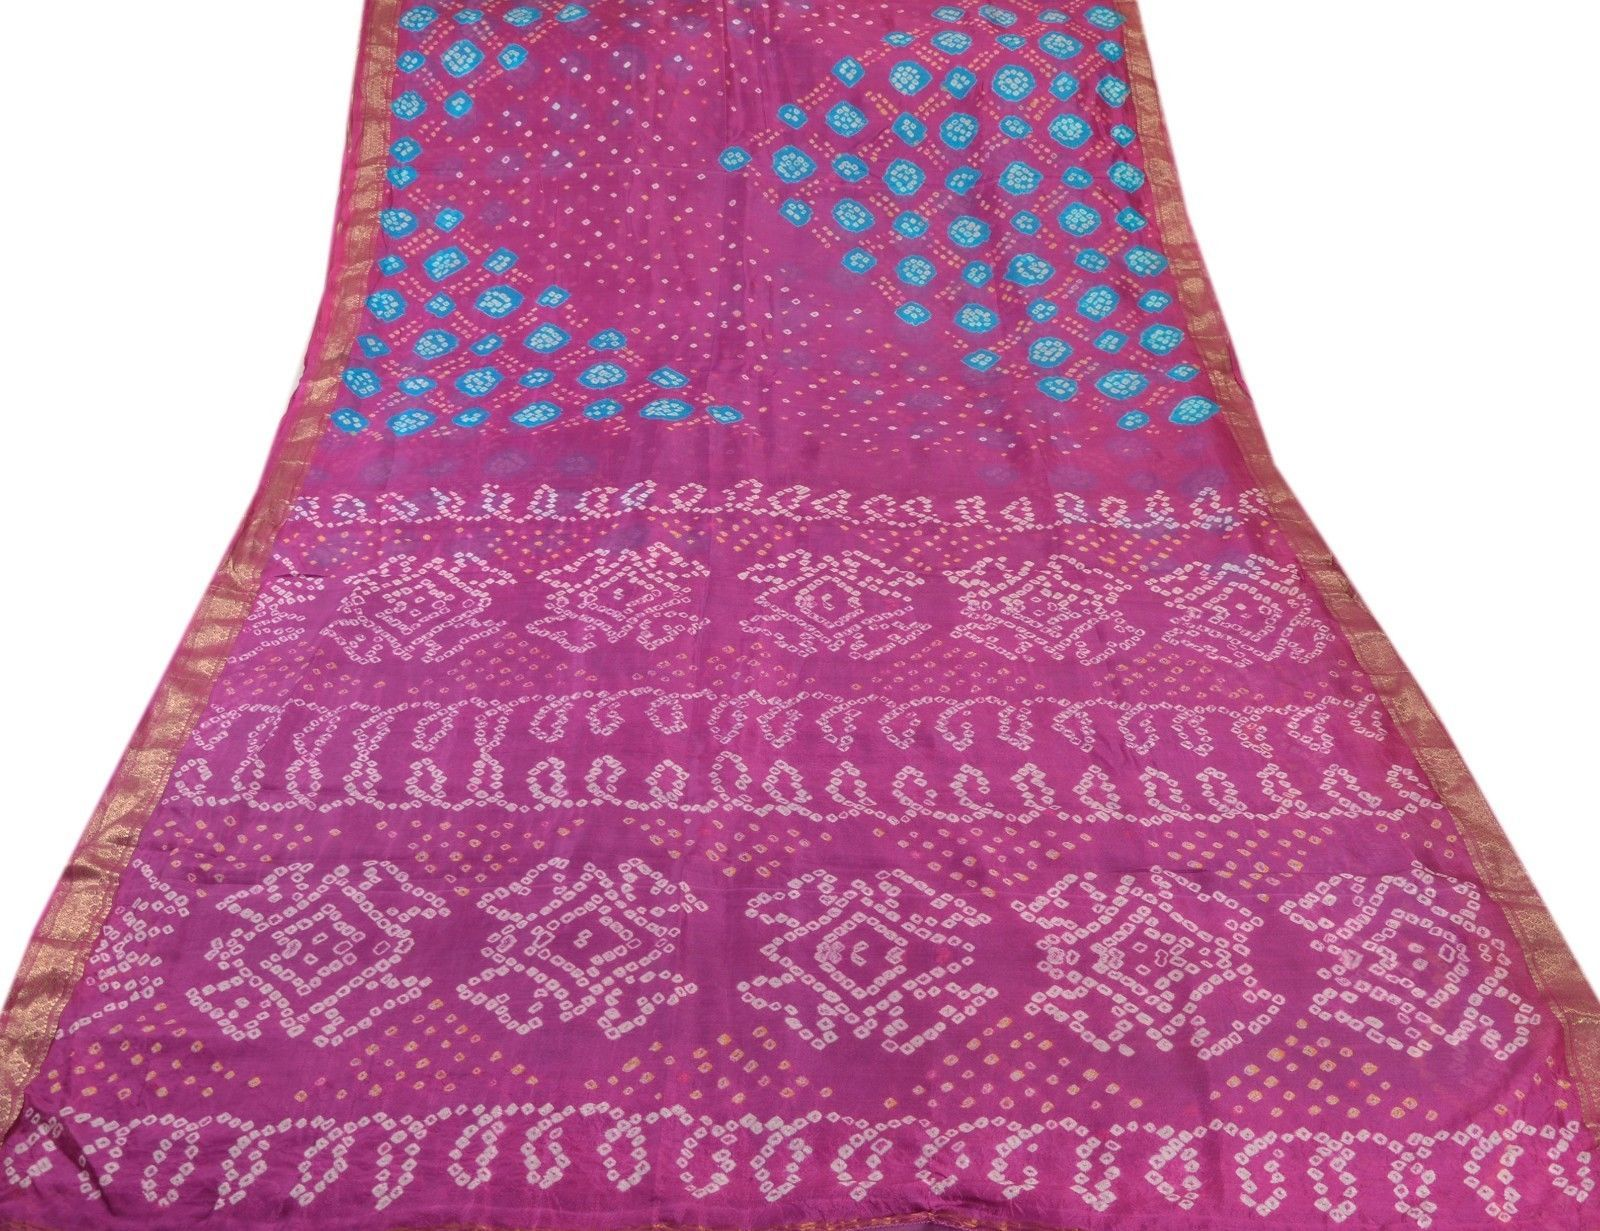 http://www.ebay.com/itm/VINTAGE-INDIAN-SAREE-PRINTED-FABRIC-PURE ...